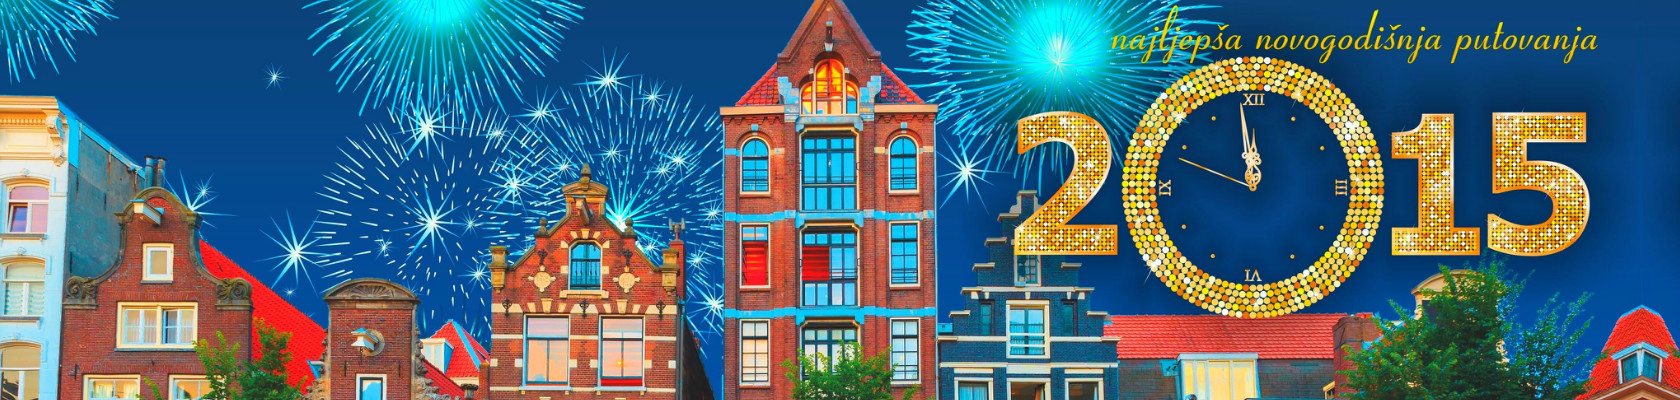 AMSTERDAM NOVA GODINA 2015.